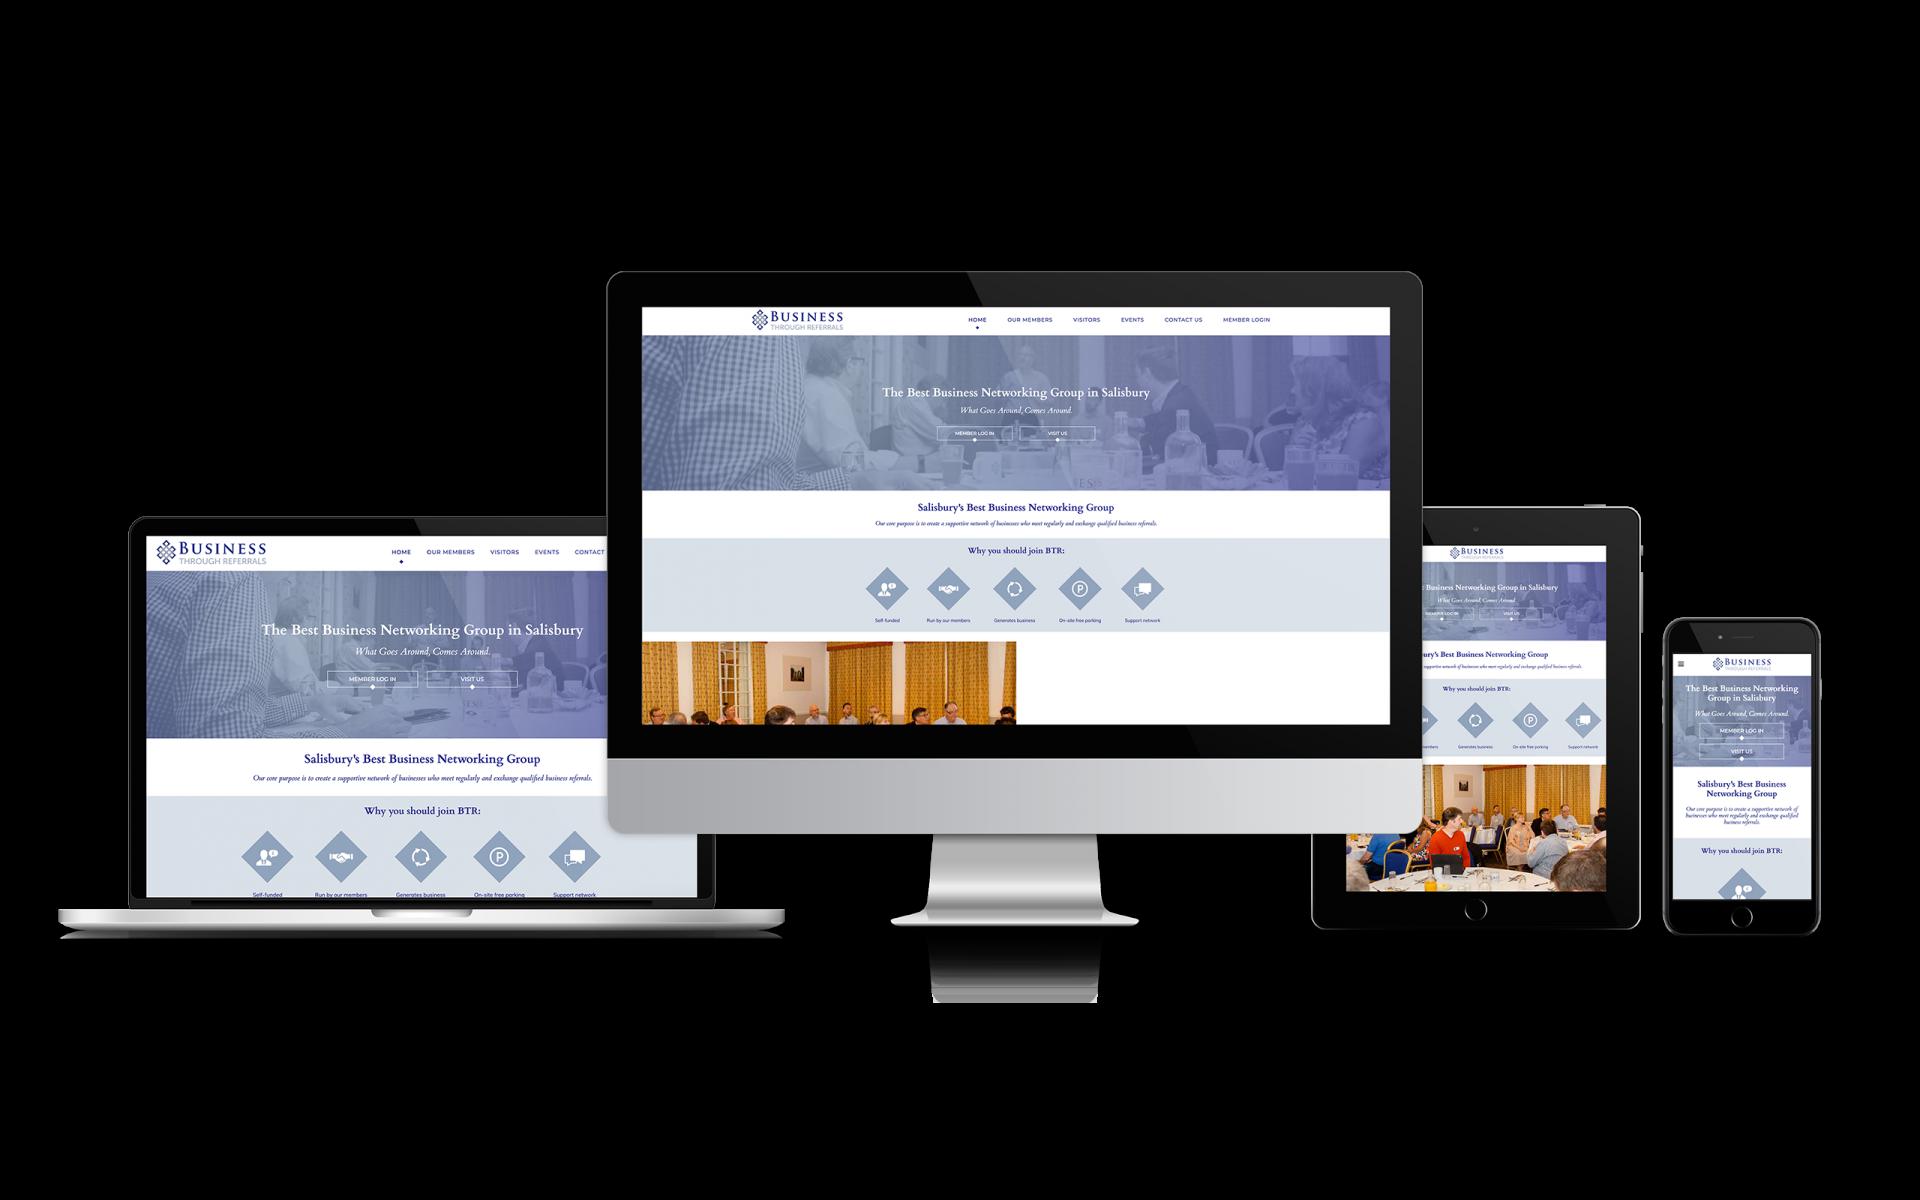 Website Design for Business Through Referrals